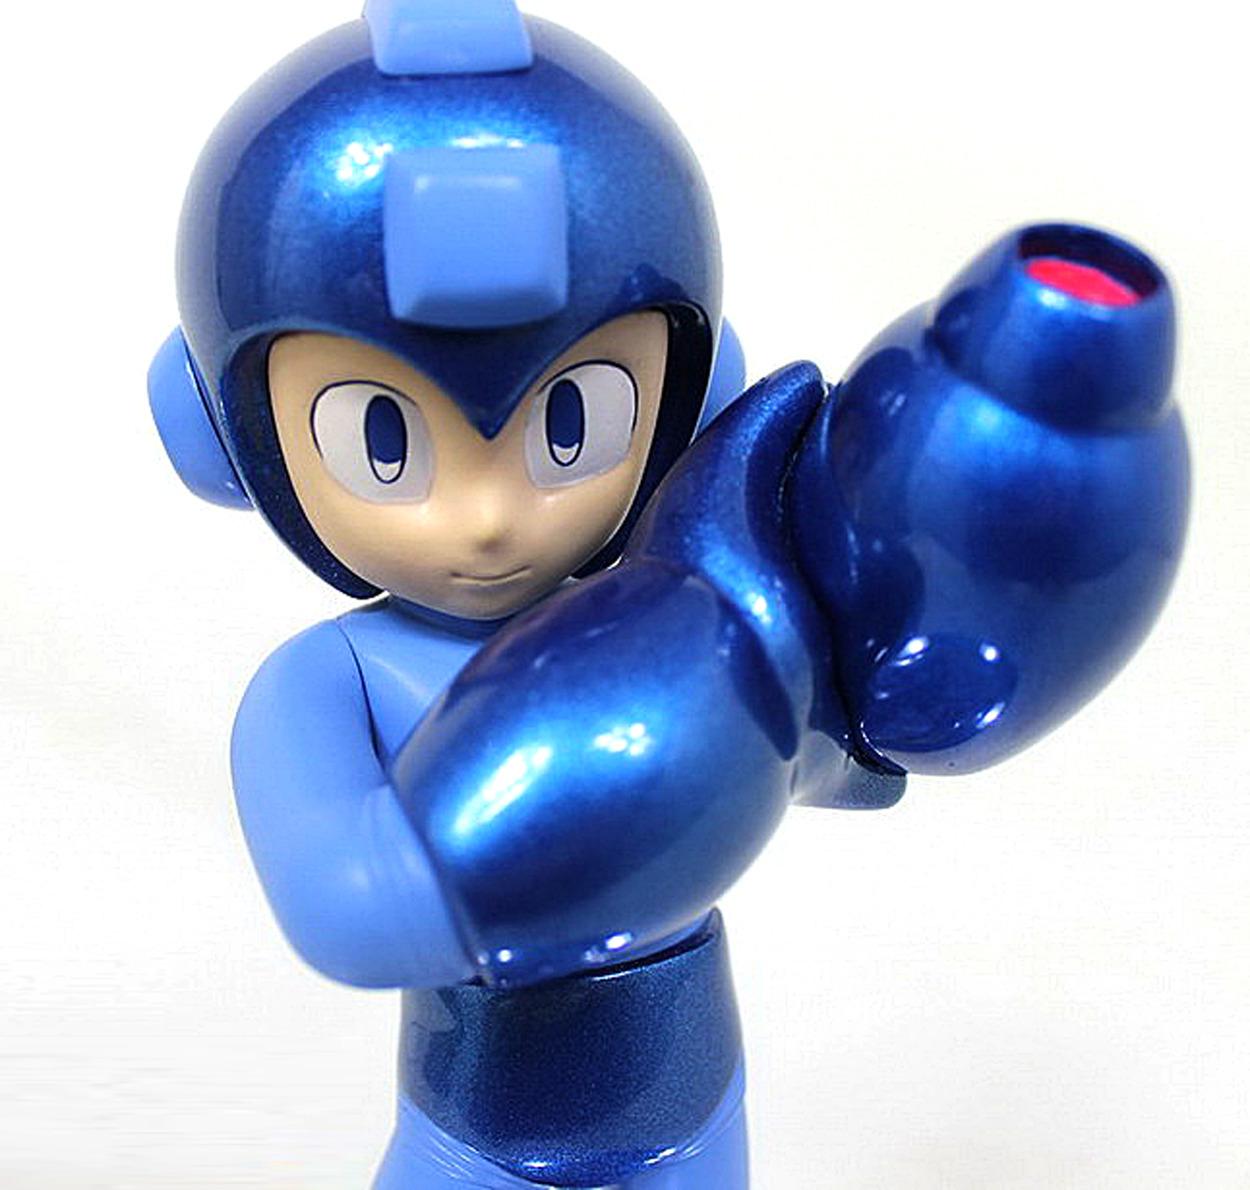 25th anniversary Mega Man statue 25-04-13-001